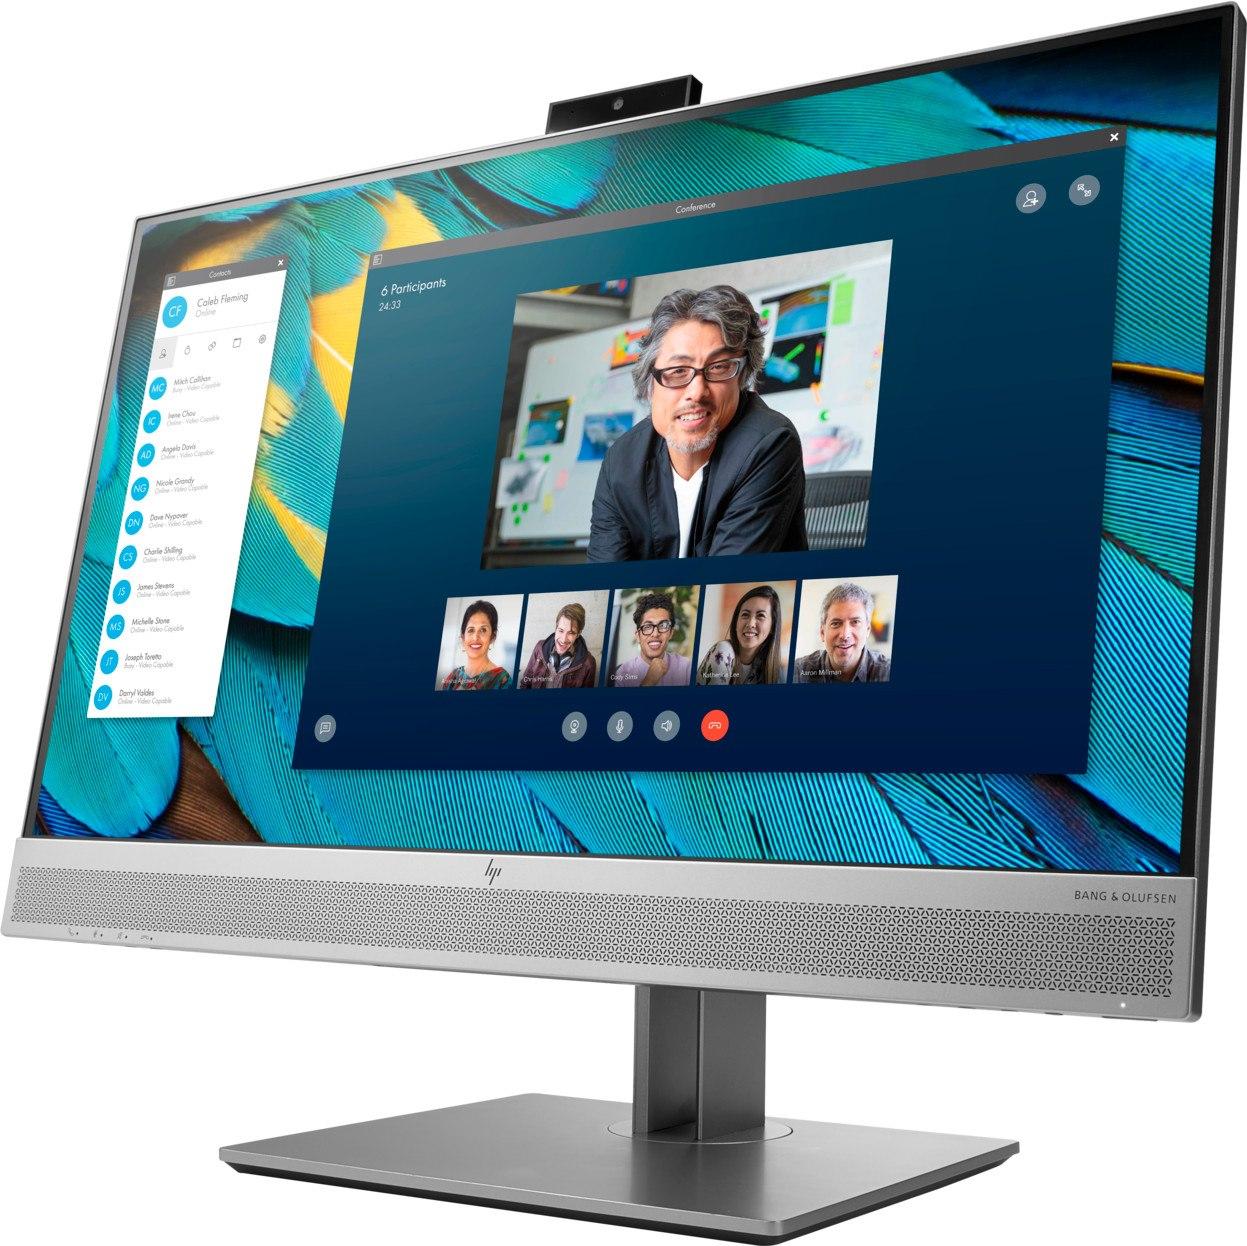 "HP Business EliteDisplay E243M 23.8"" Full HD IPS LED Monitor with Built-In WEBCAM"